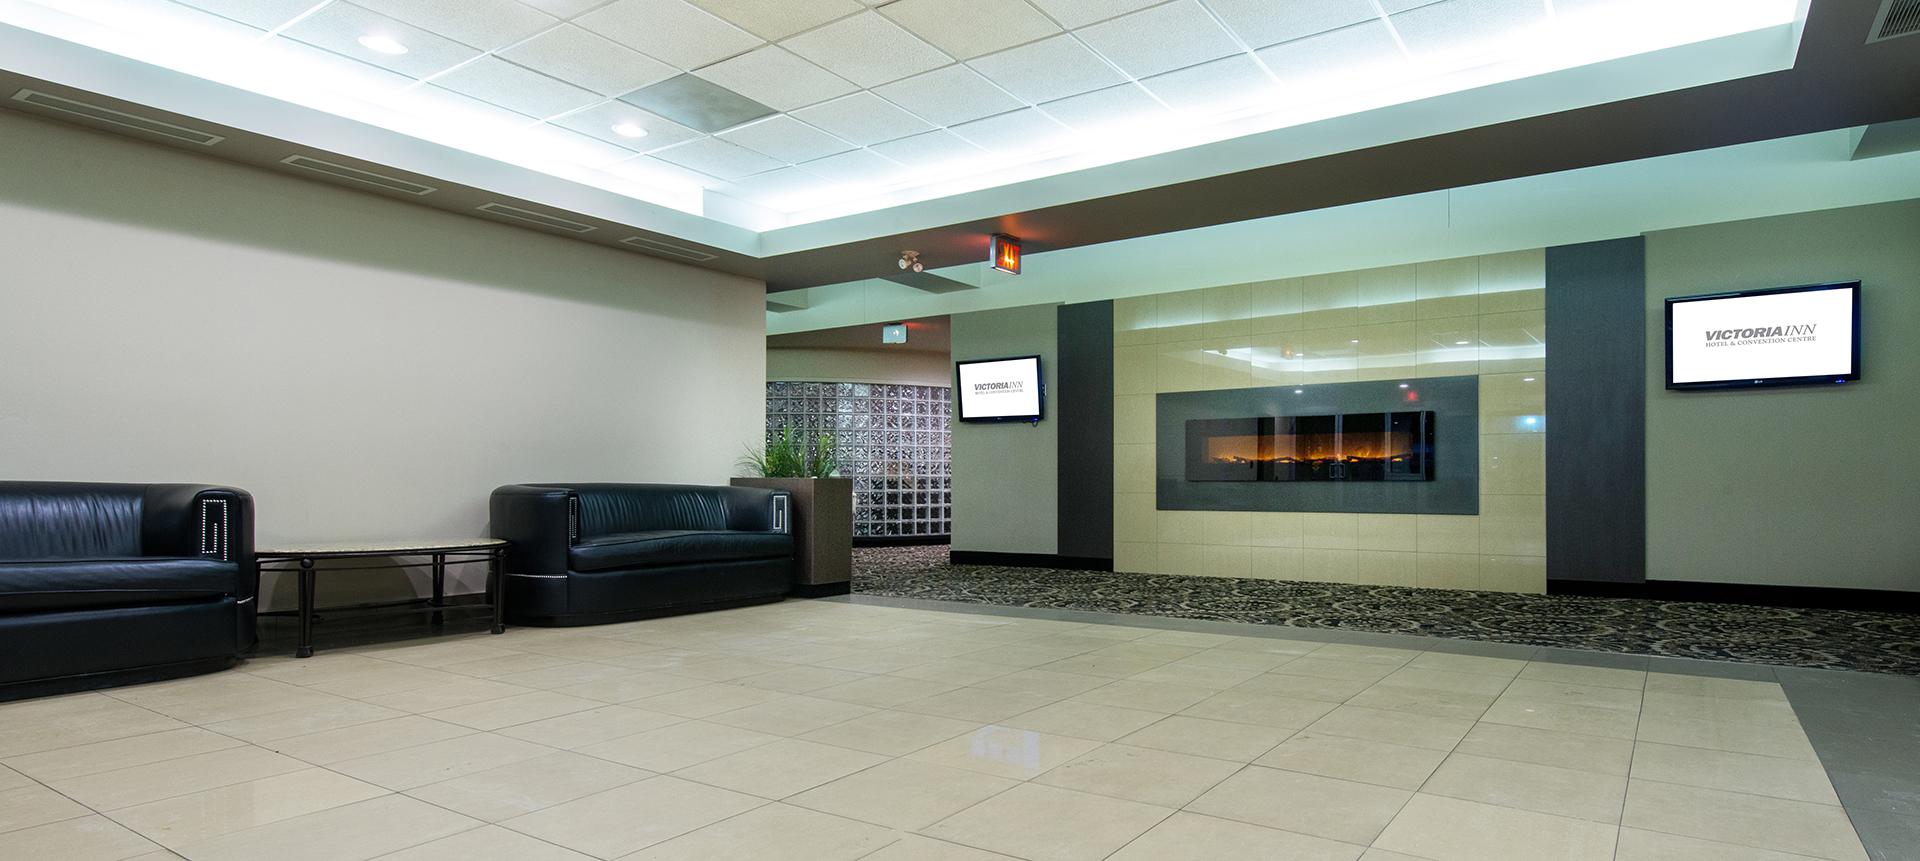 Thunder Bay Airport Hotel | Victoria Inn | Thunder Bay, ON